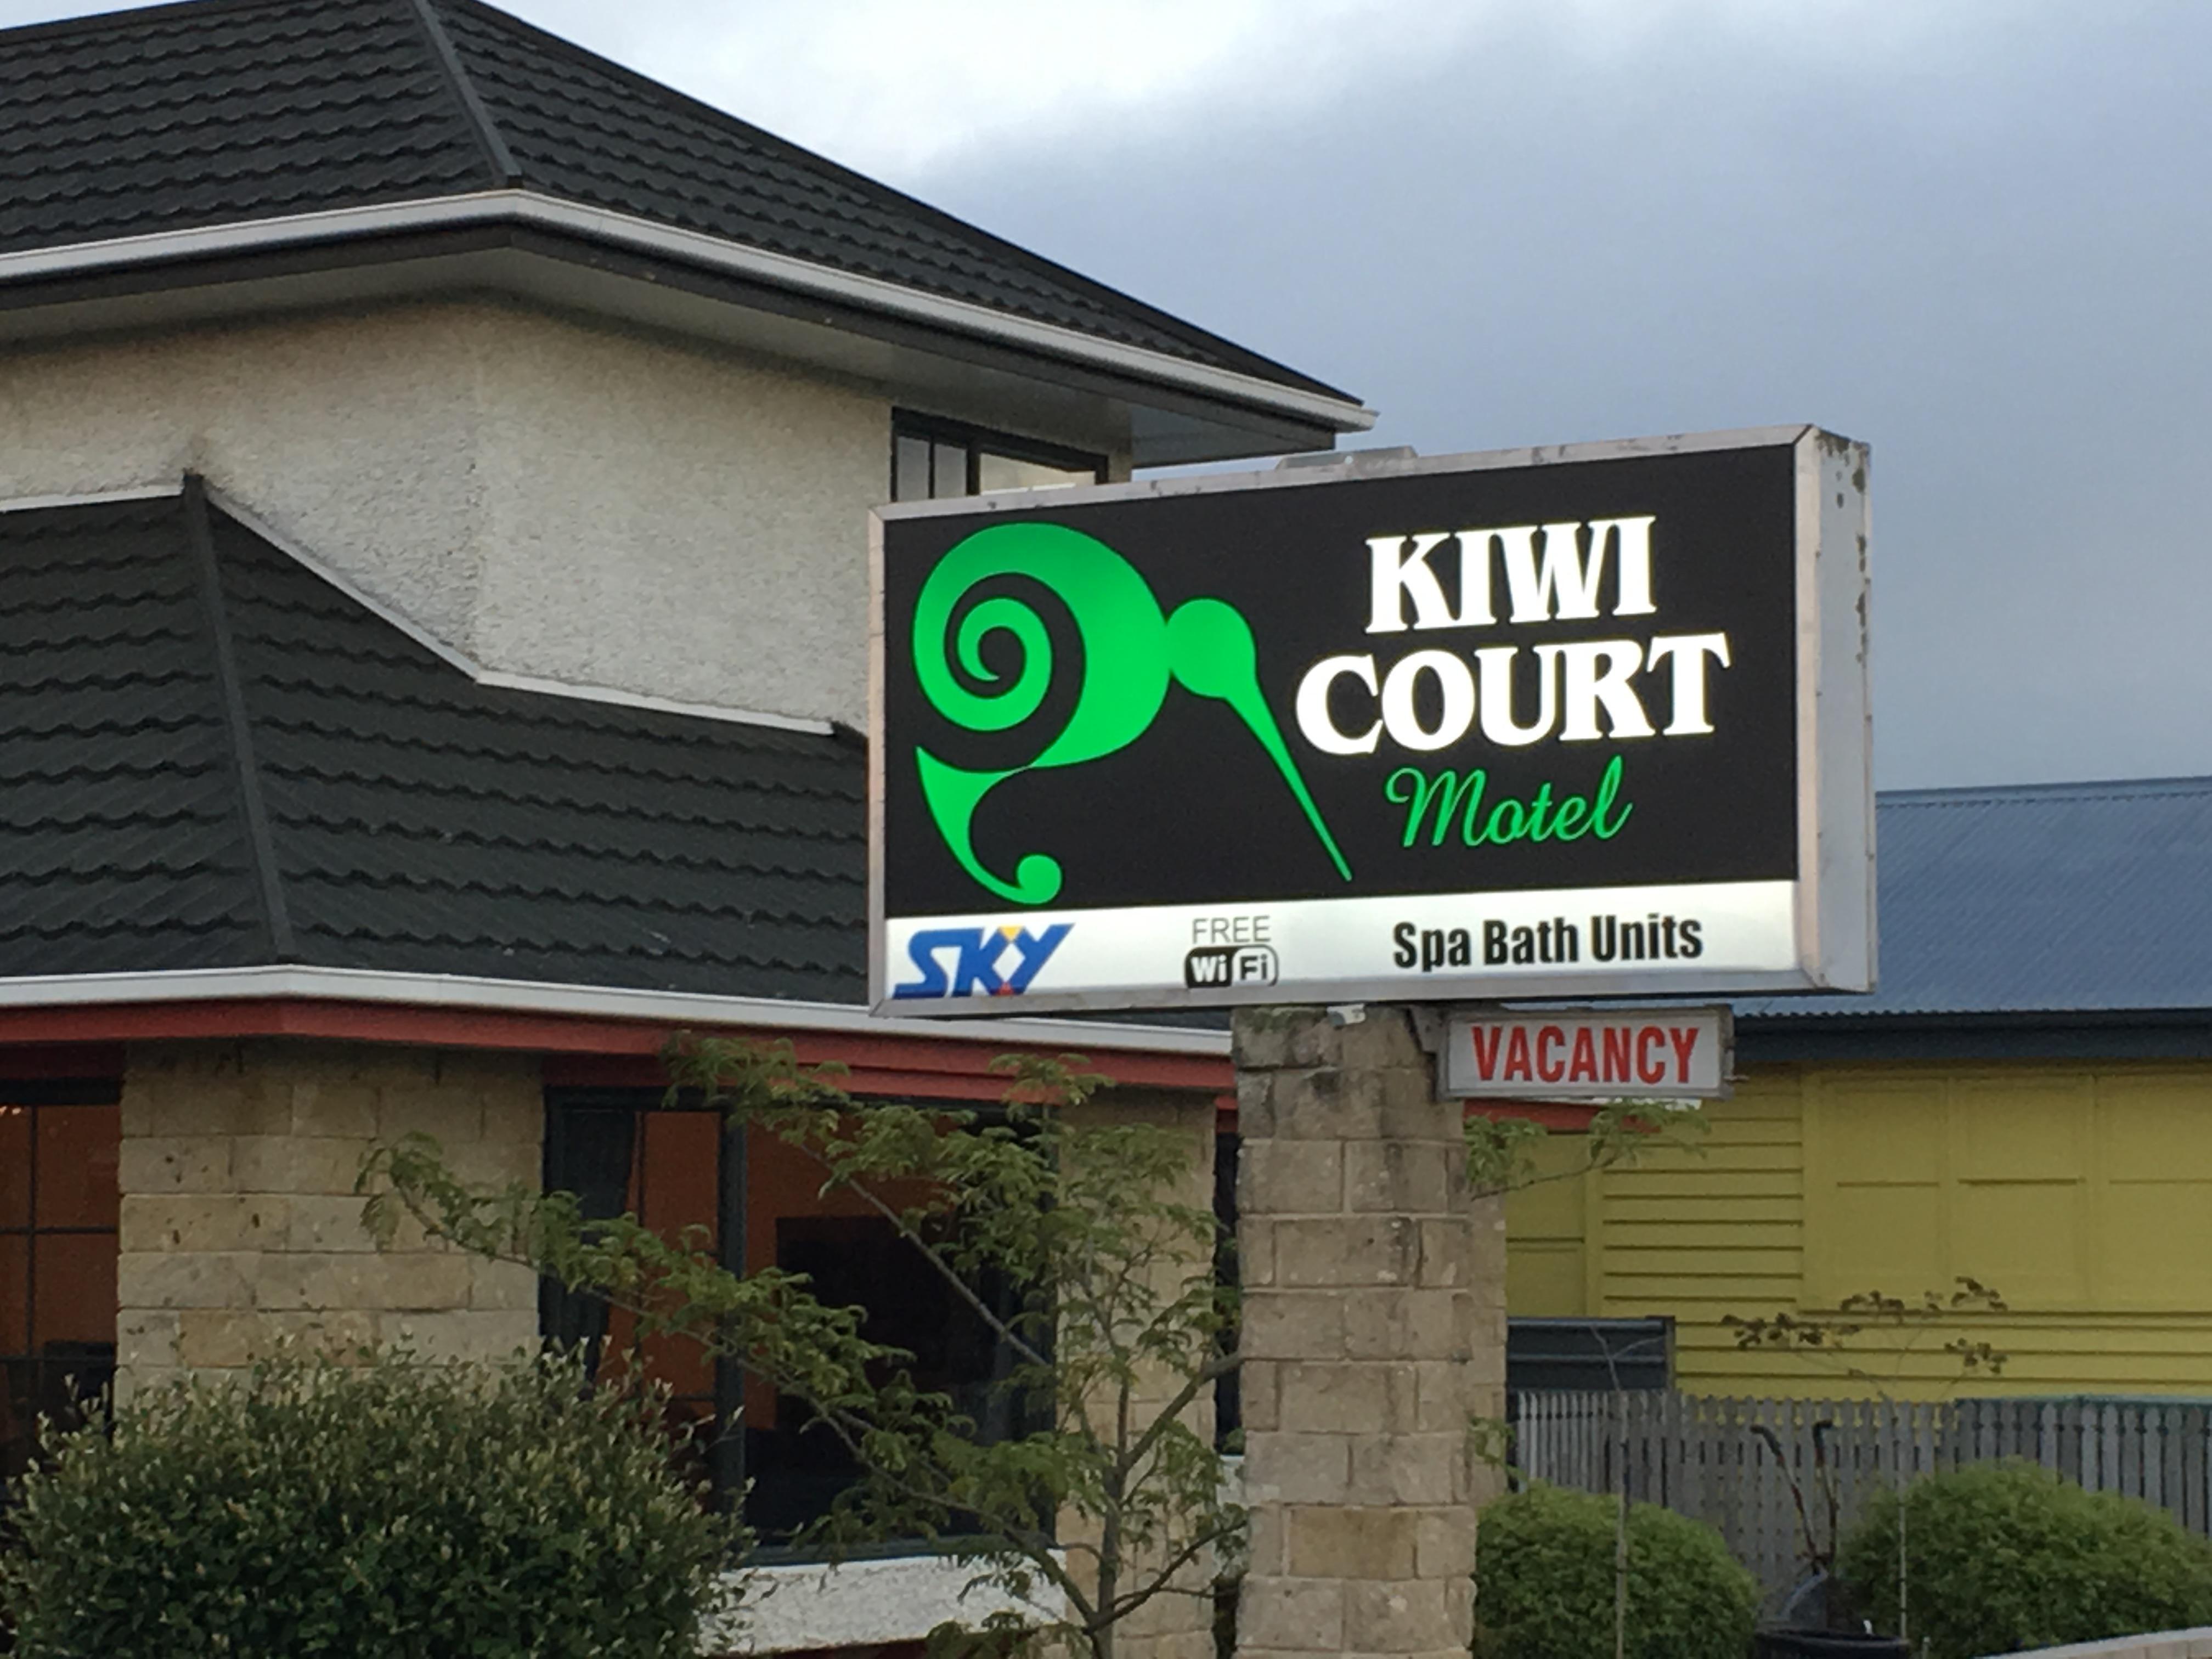 Kiwi Court Motel